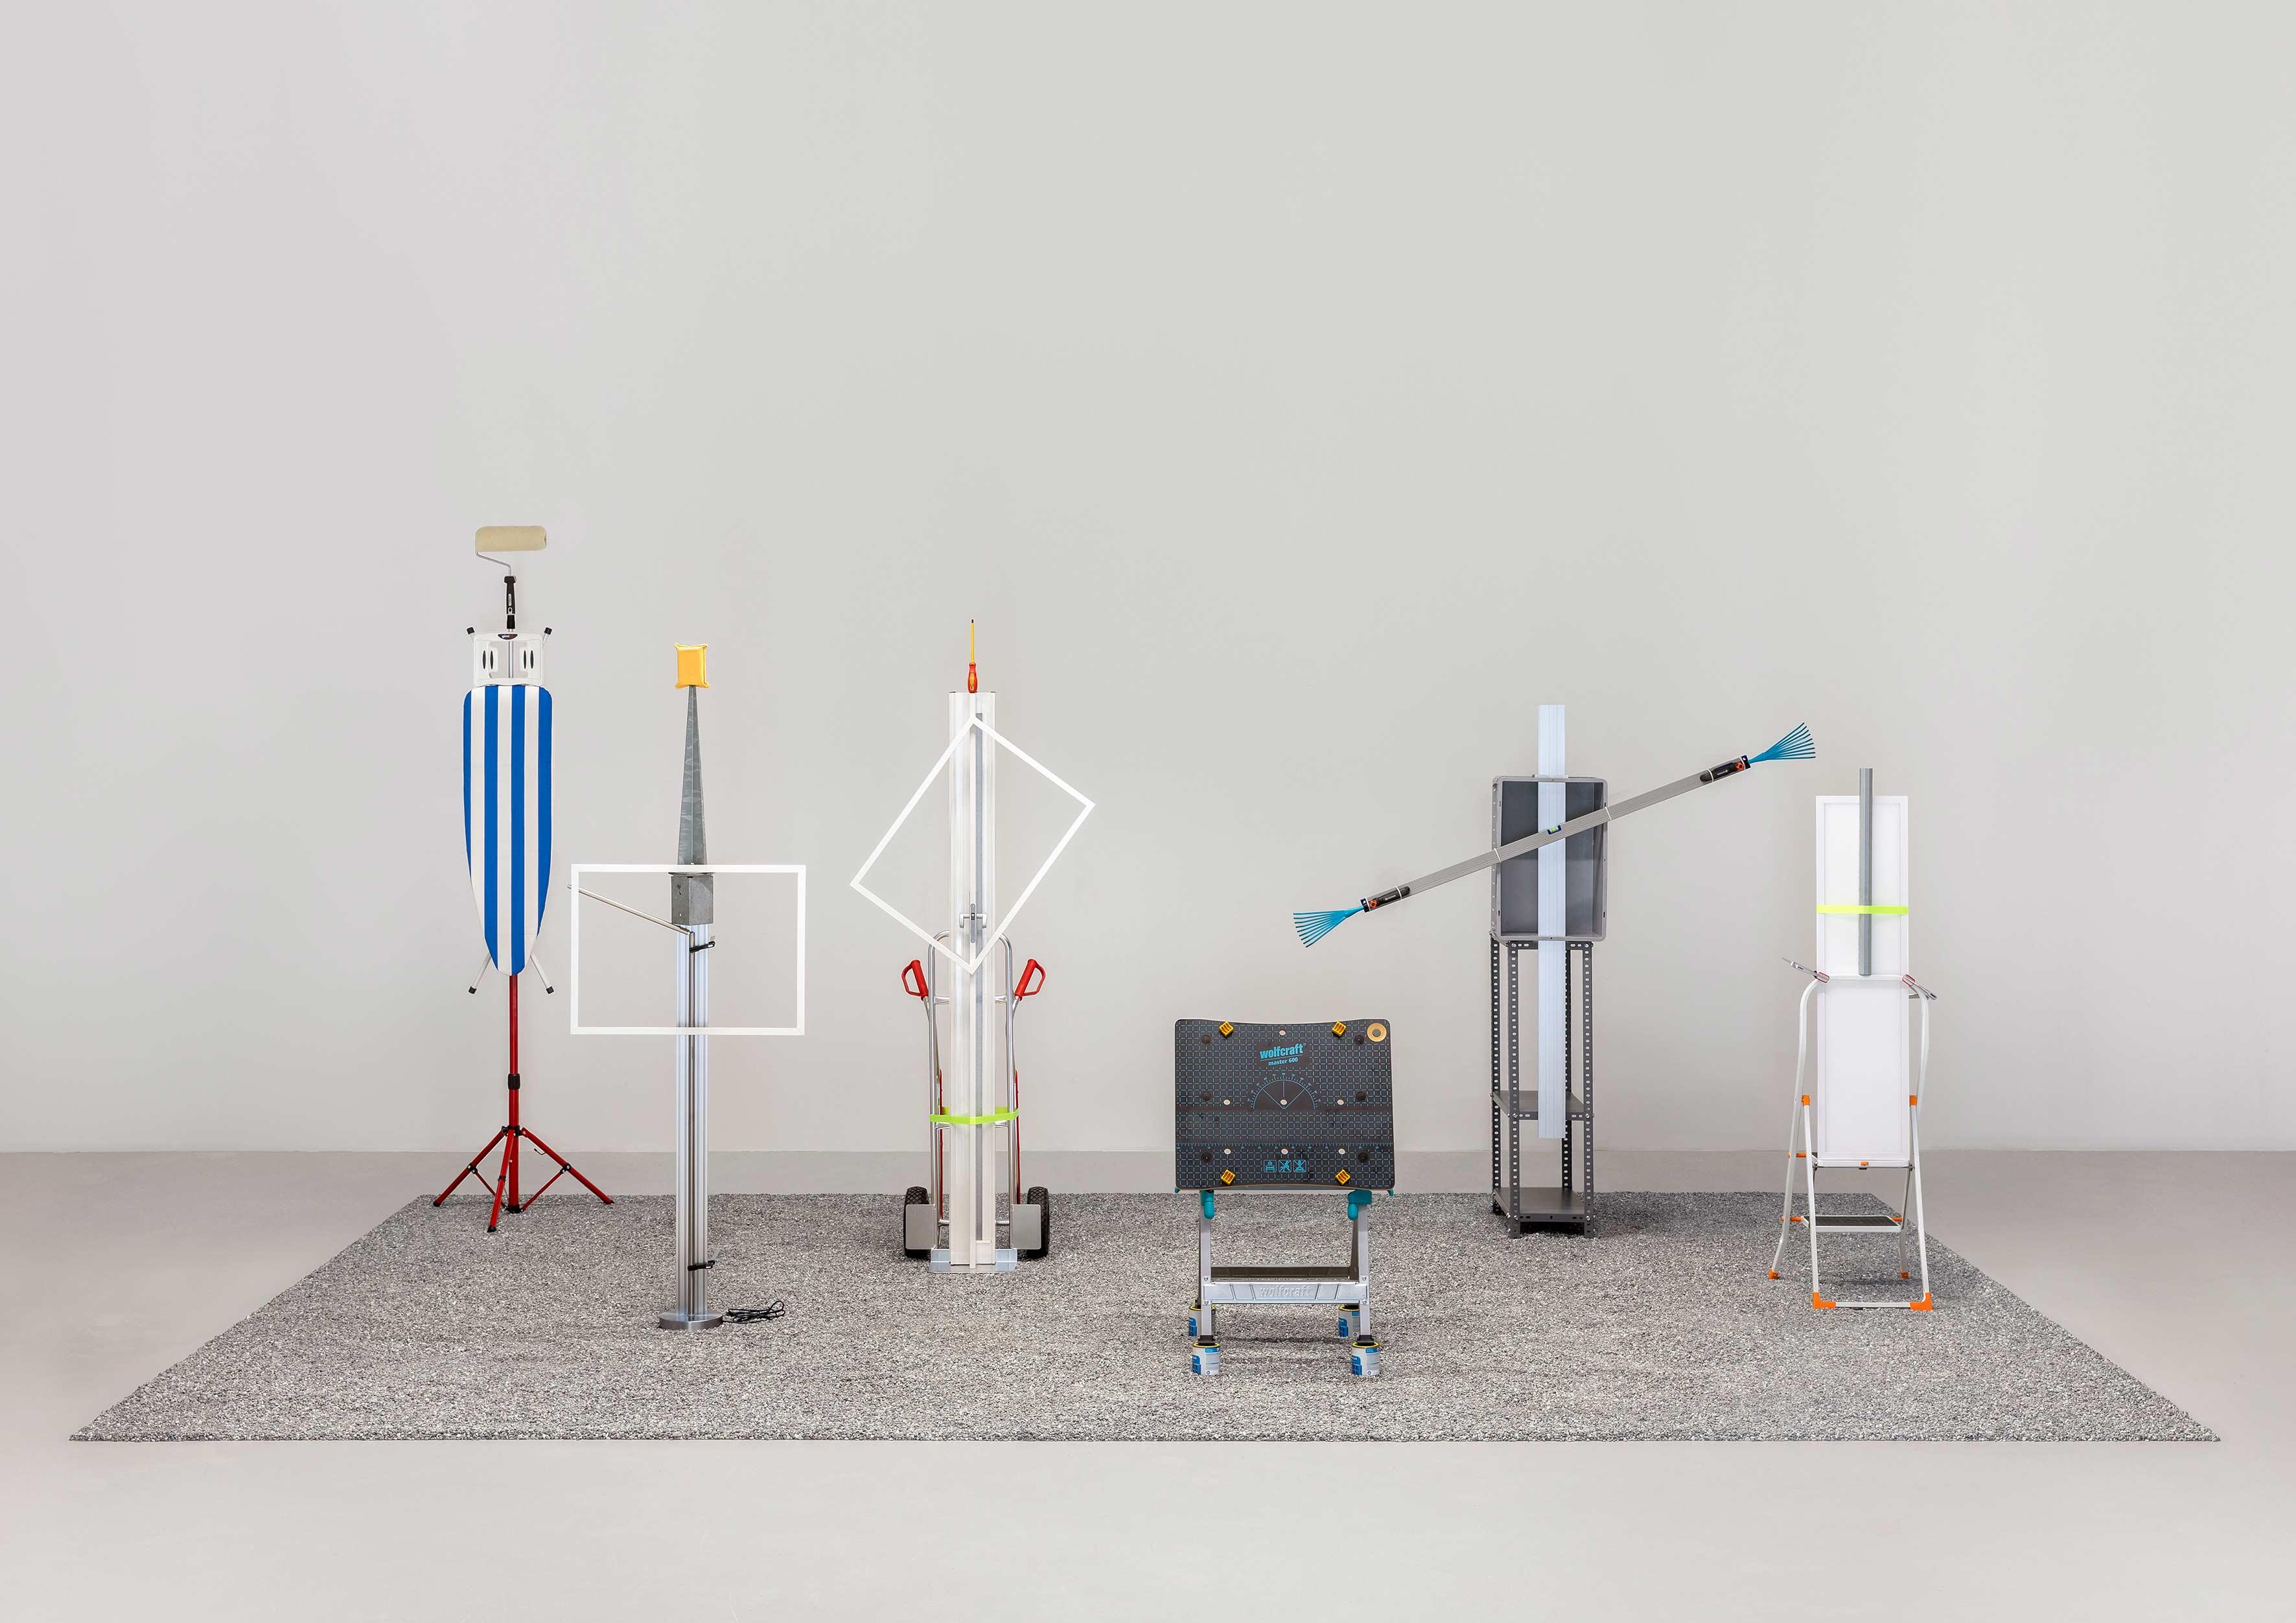 kunstmeile hamburg deichtorhallen hamburg. Black Bedroom Furniture Sets. Home Design Ideas